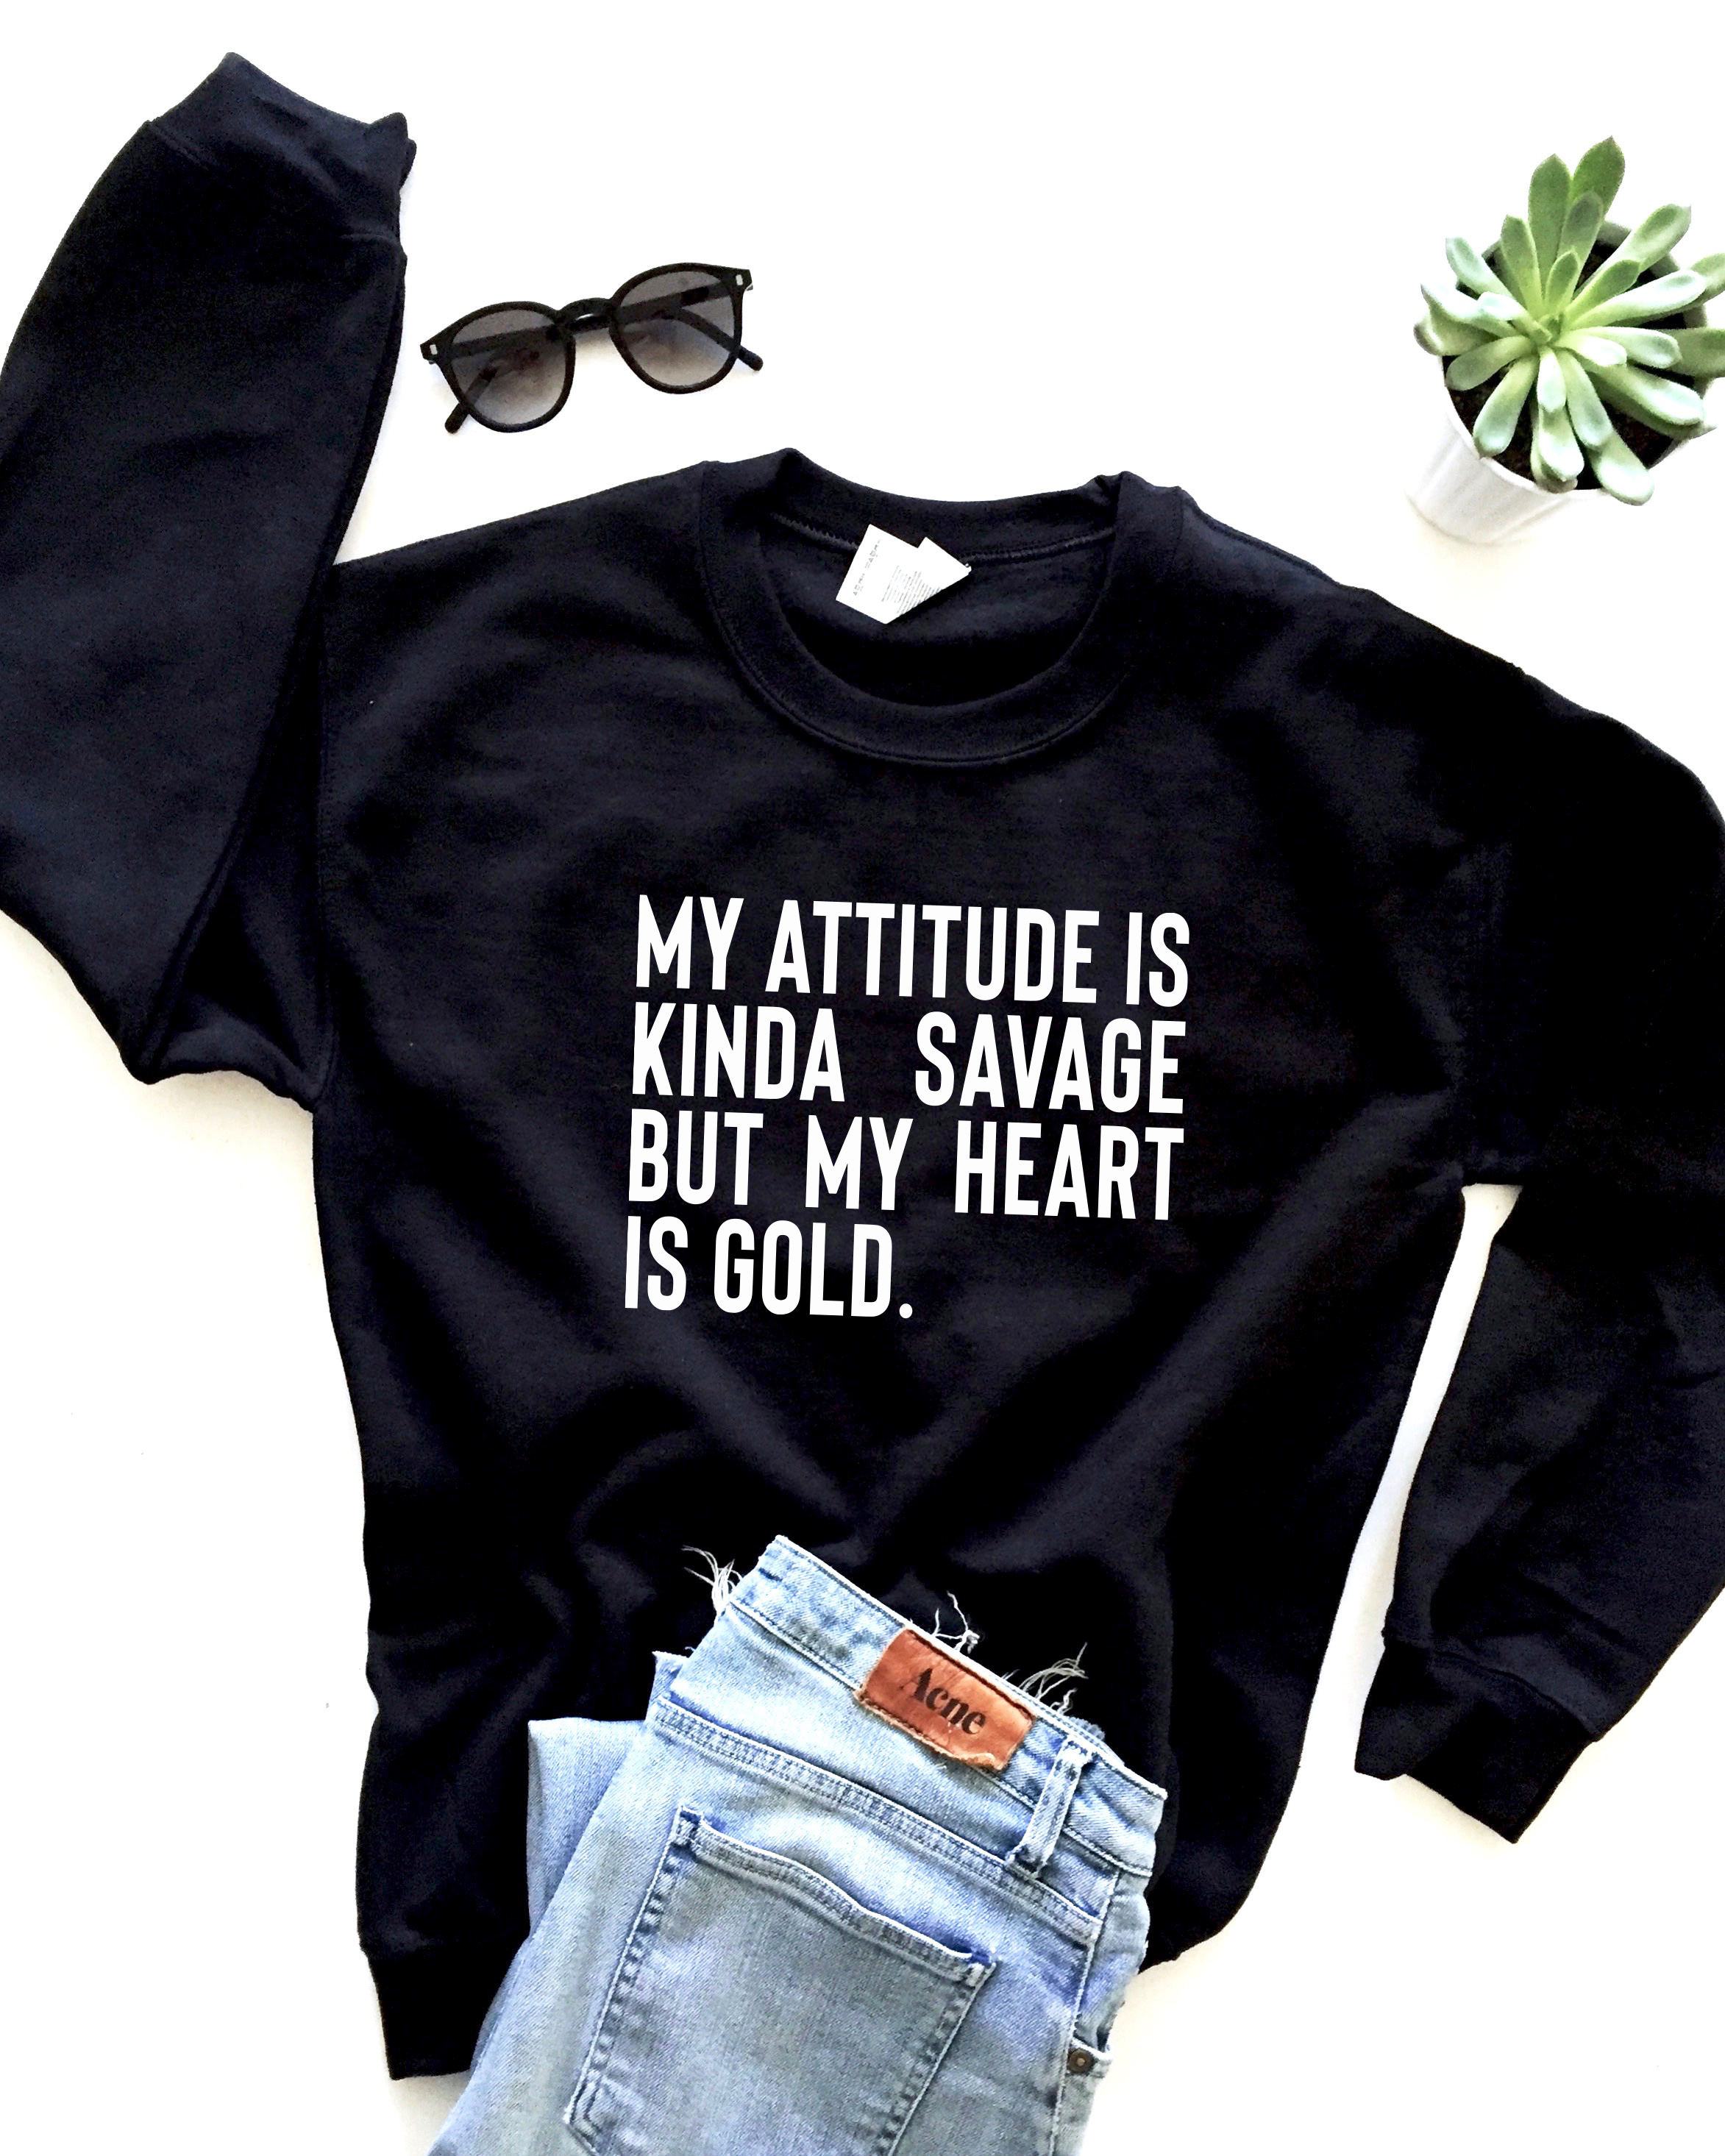 28f69e76 My attitude is kinda savage but my heart is gold. Sweatshirt ...